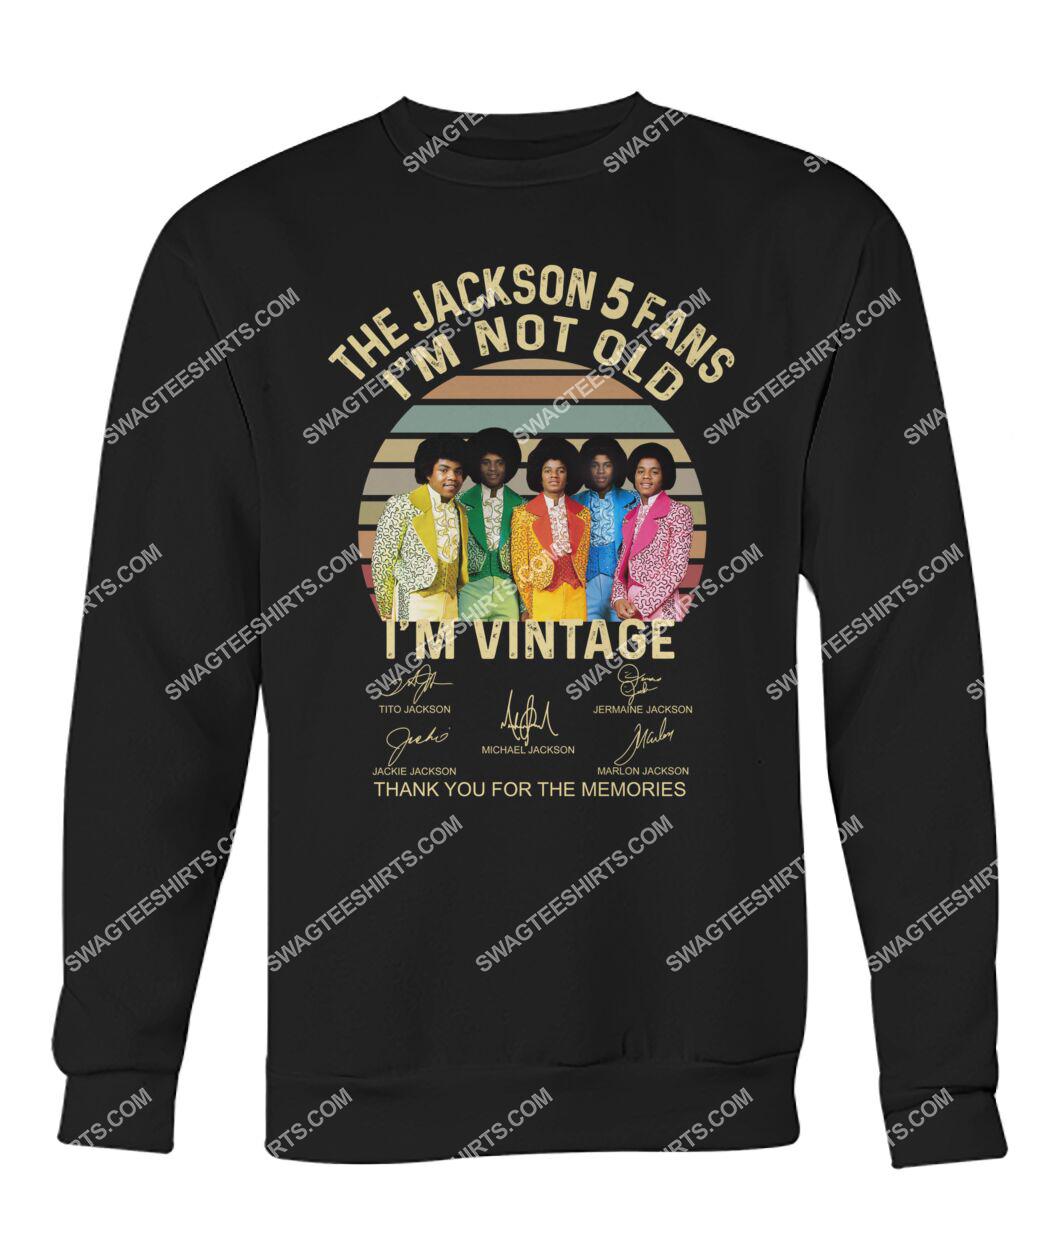 the jackson 5 fans i'm not old i'm vintage sweatshirt 1